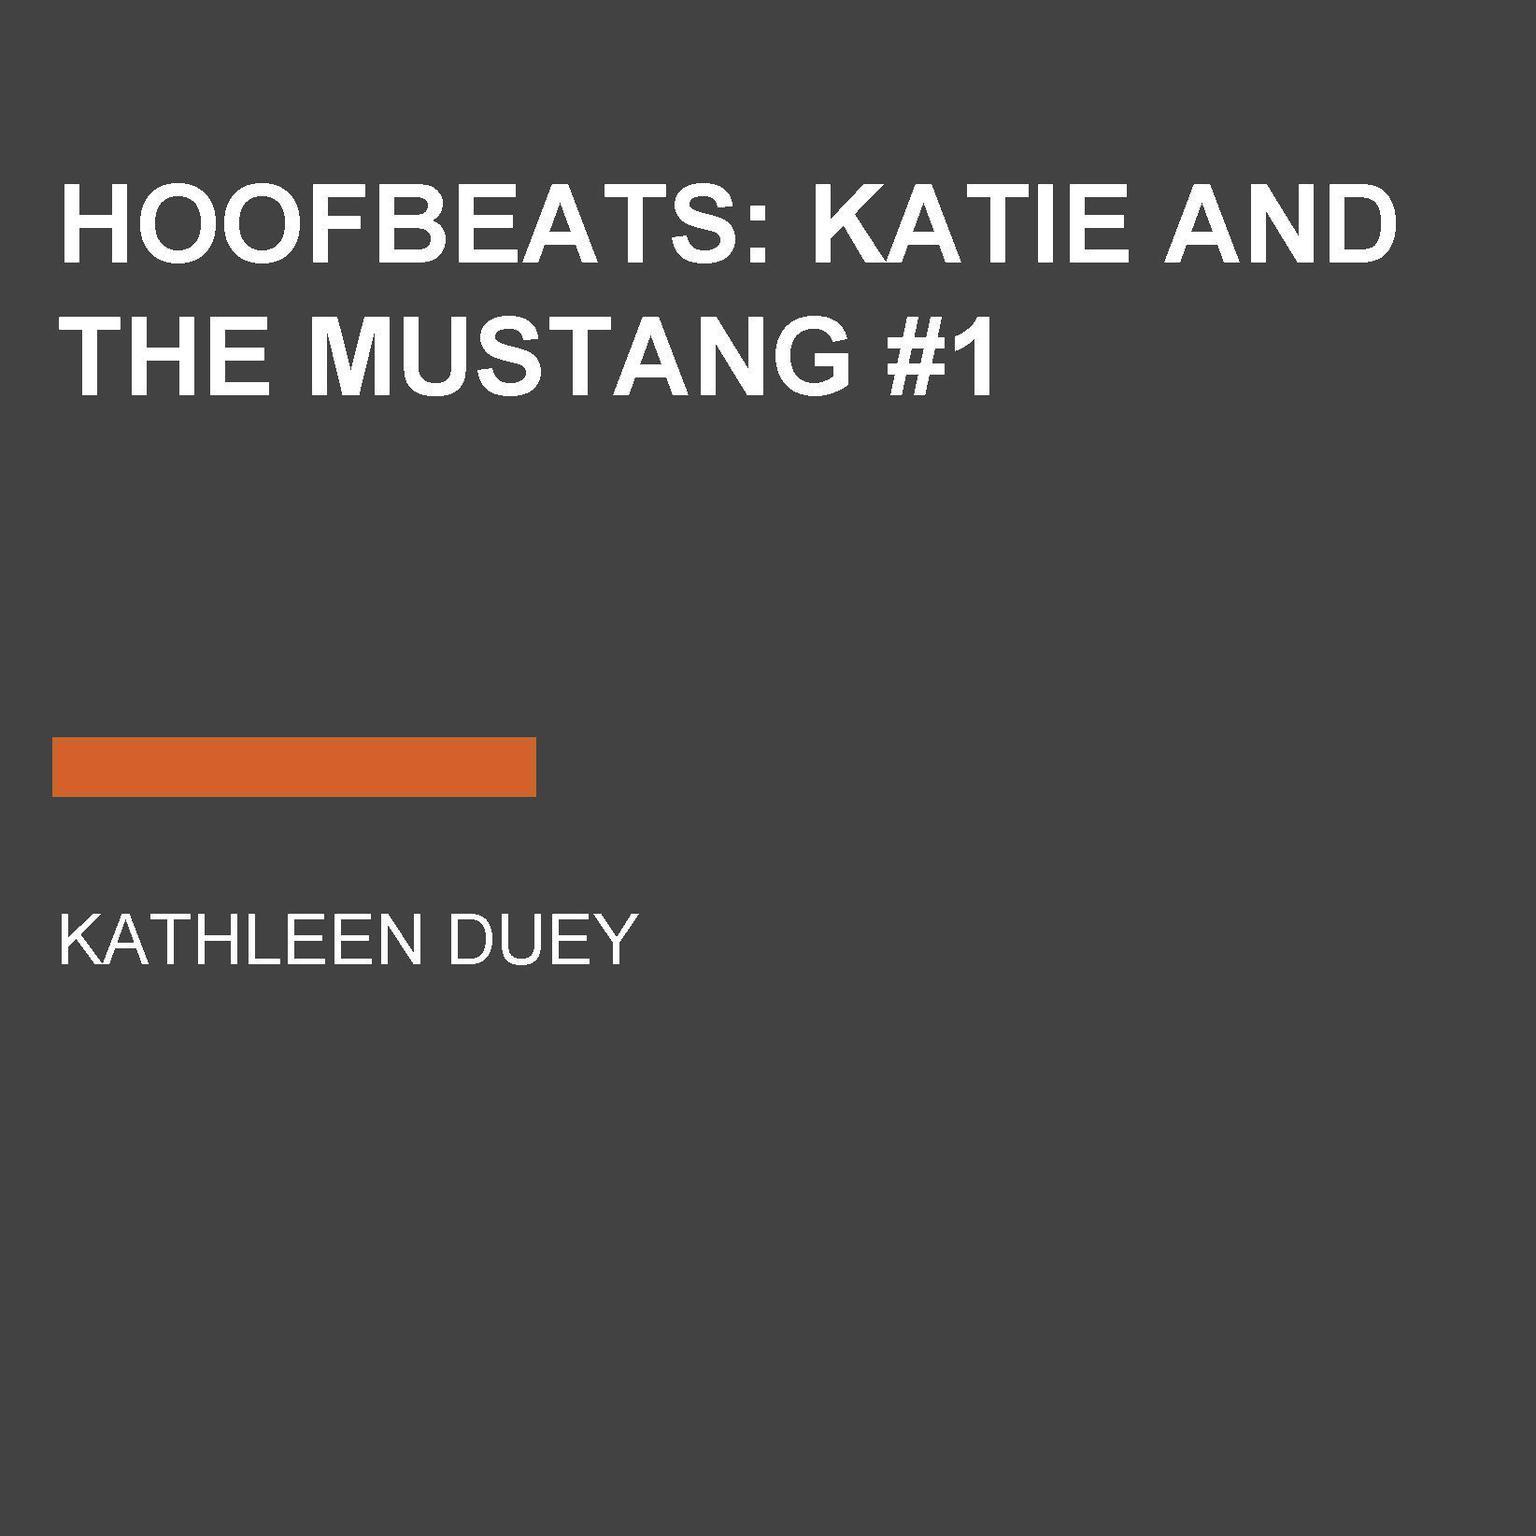 Hoofbeats: Katie and the Mustang #1 Audiobook, by Kathleen Duey